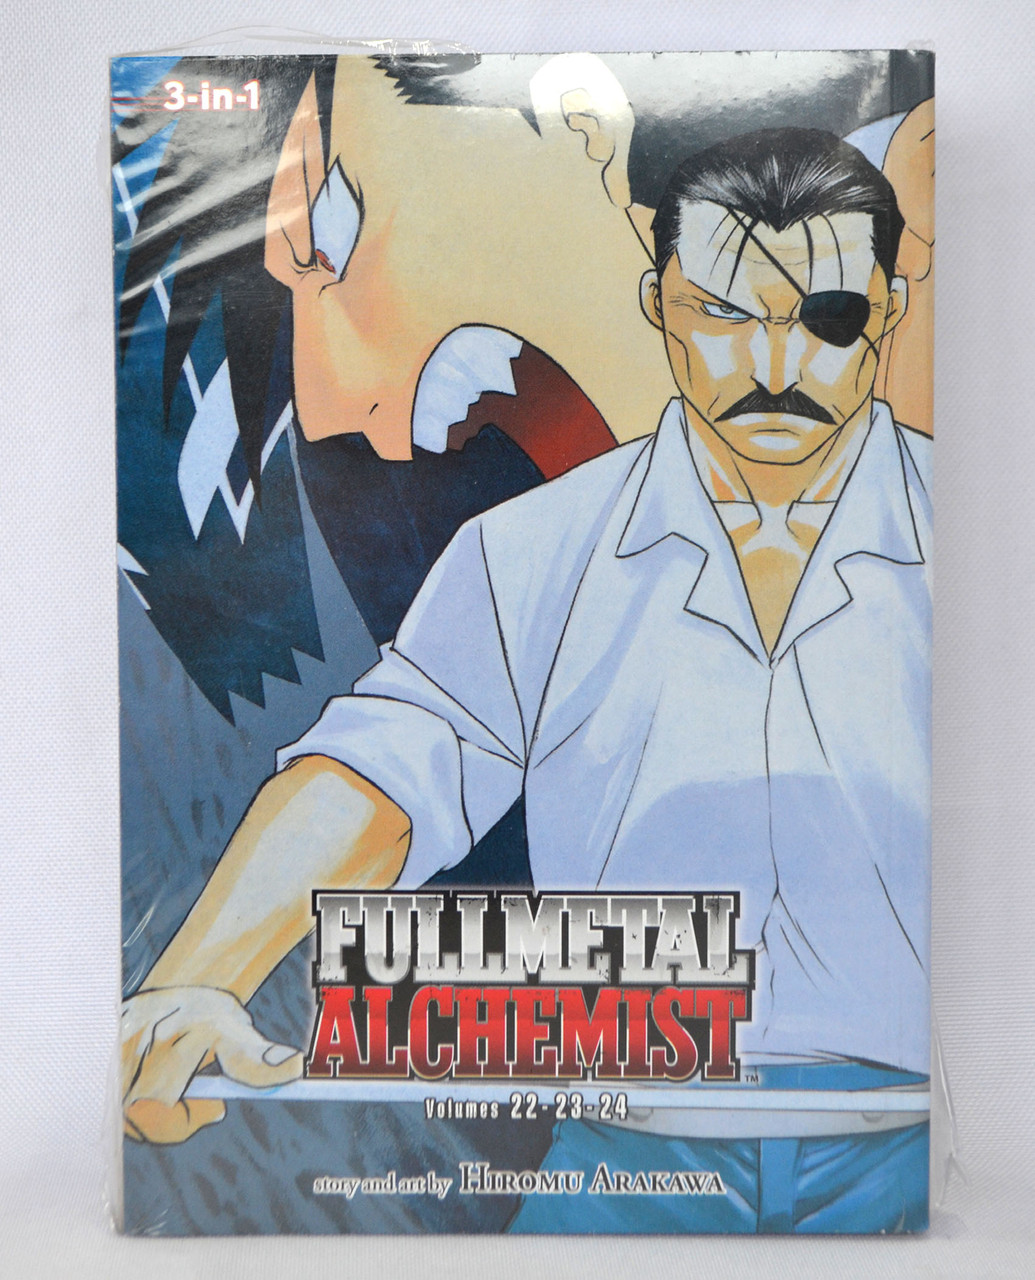 Manga Fullmetal Alchemist (3-in-1 Edition), Vol. 8 (English language)